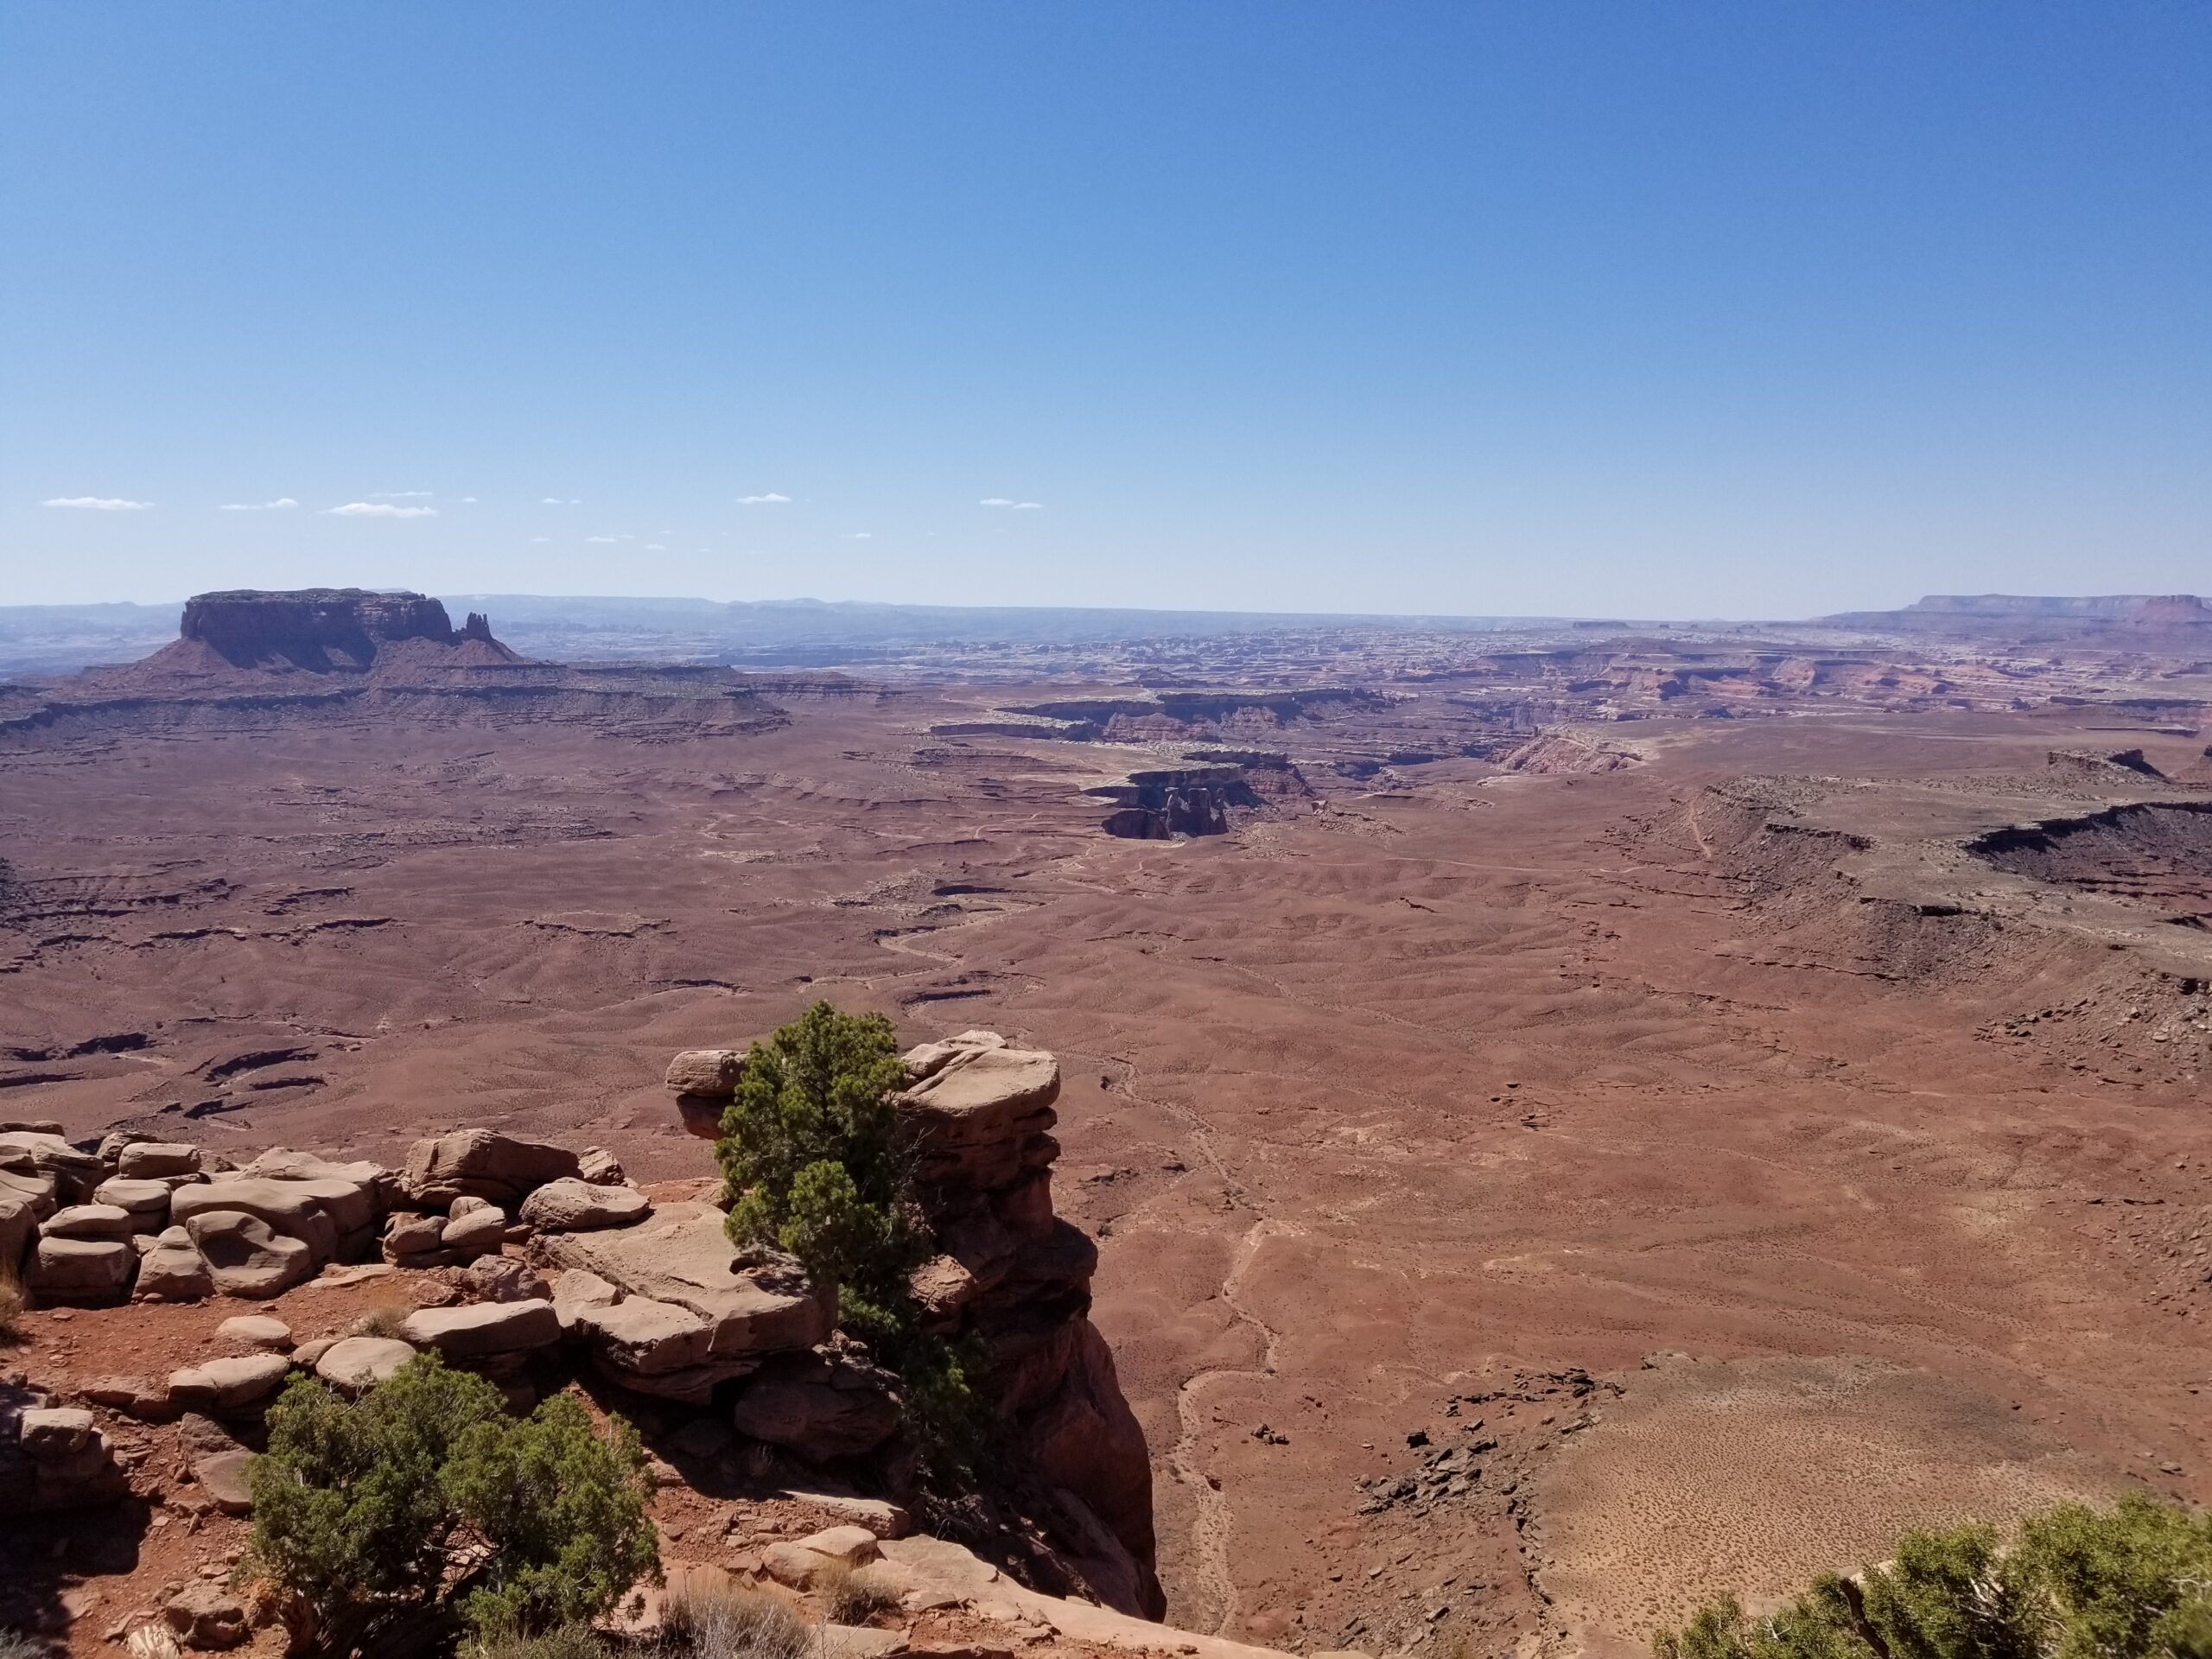 CanyonlandsVista5